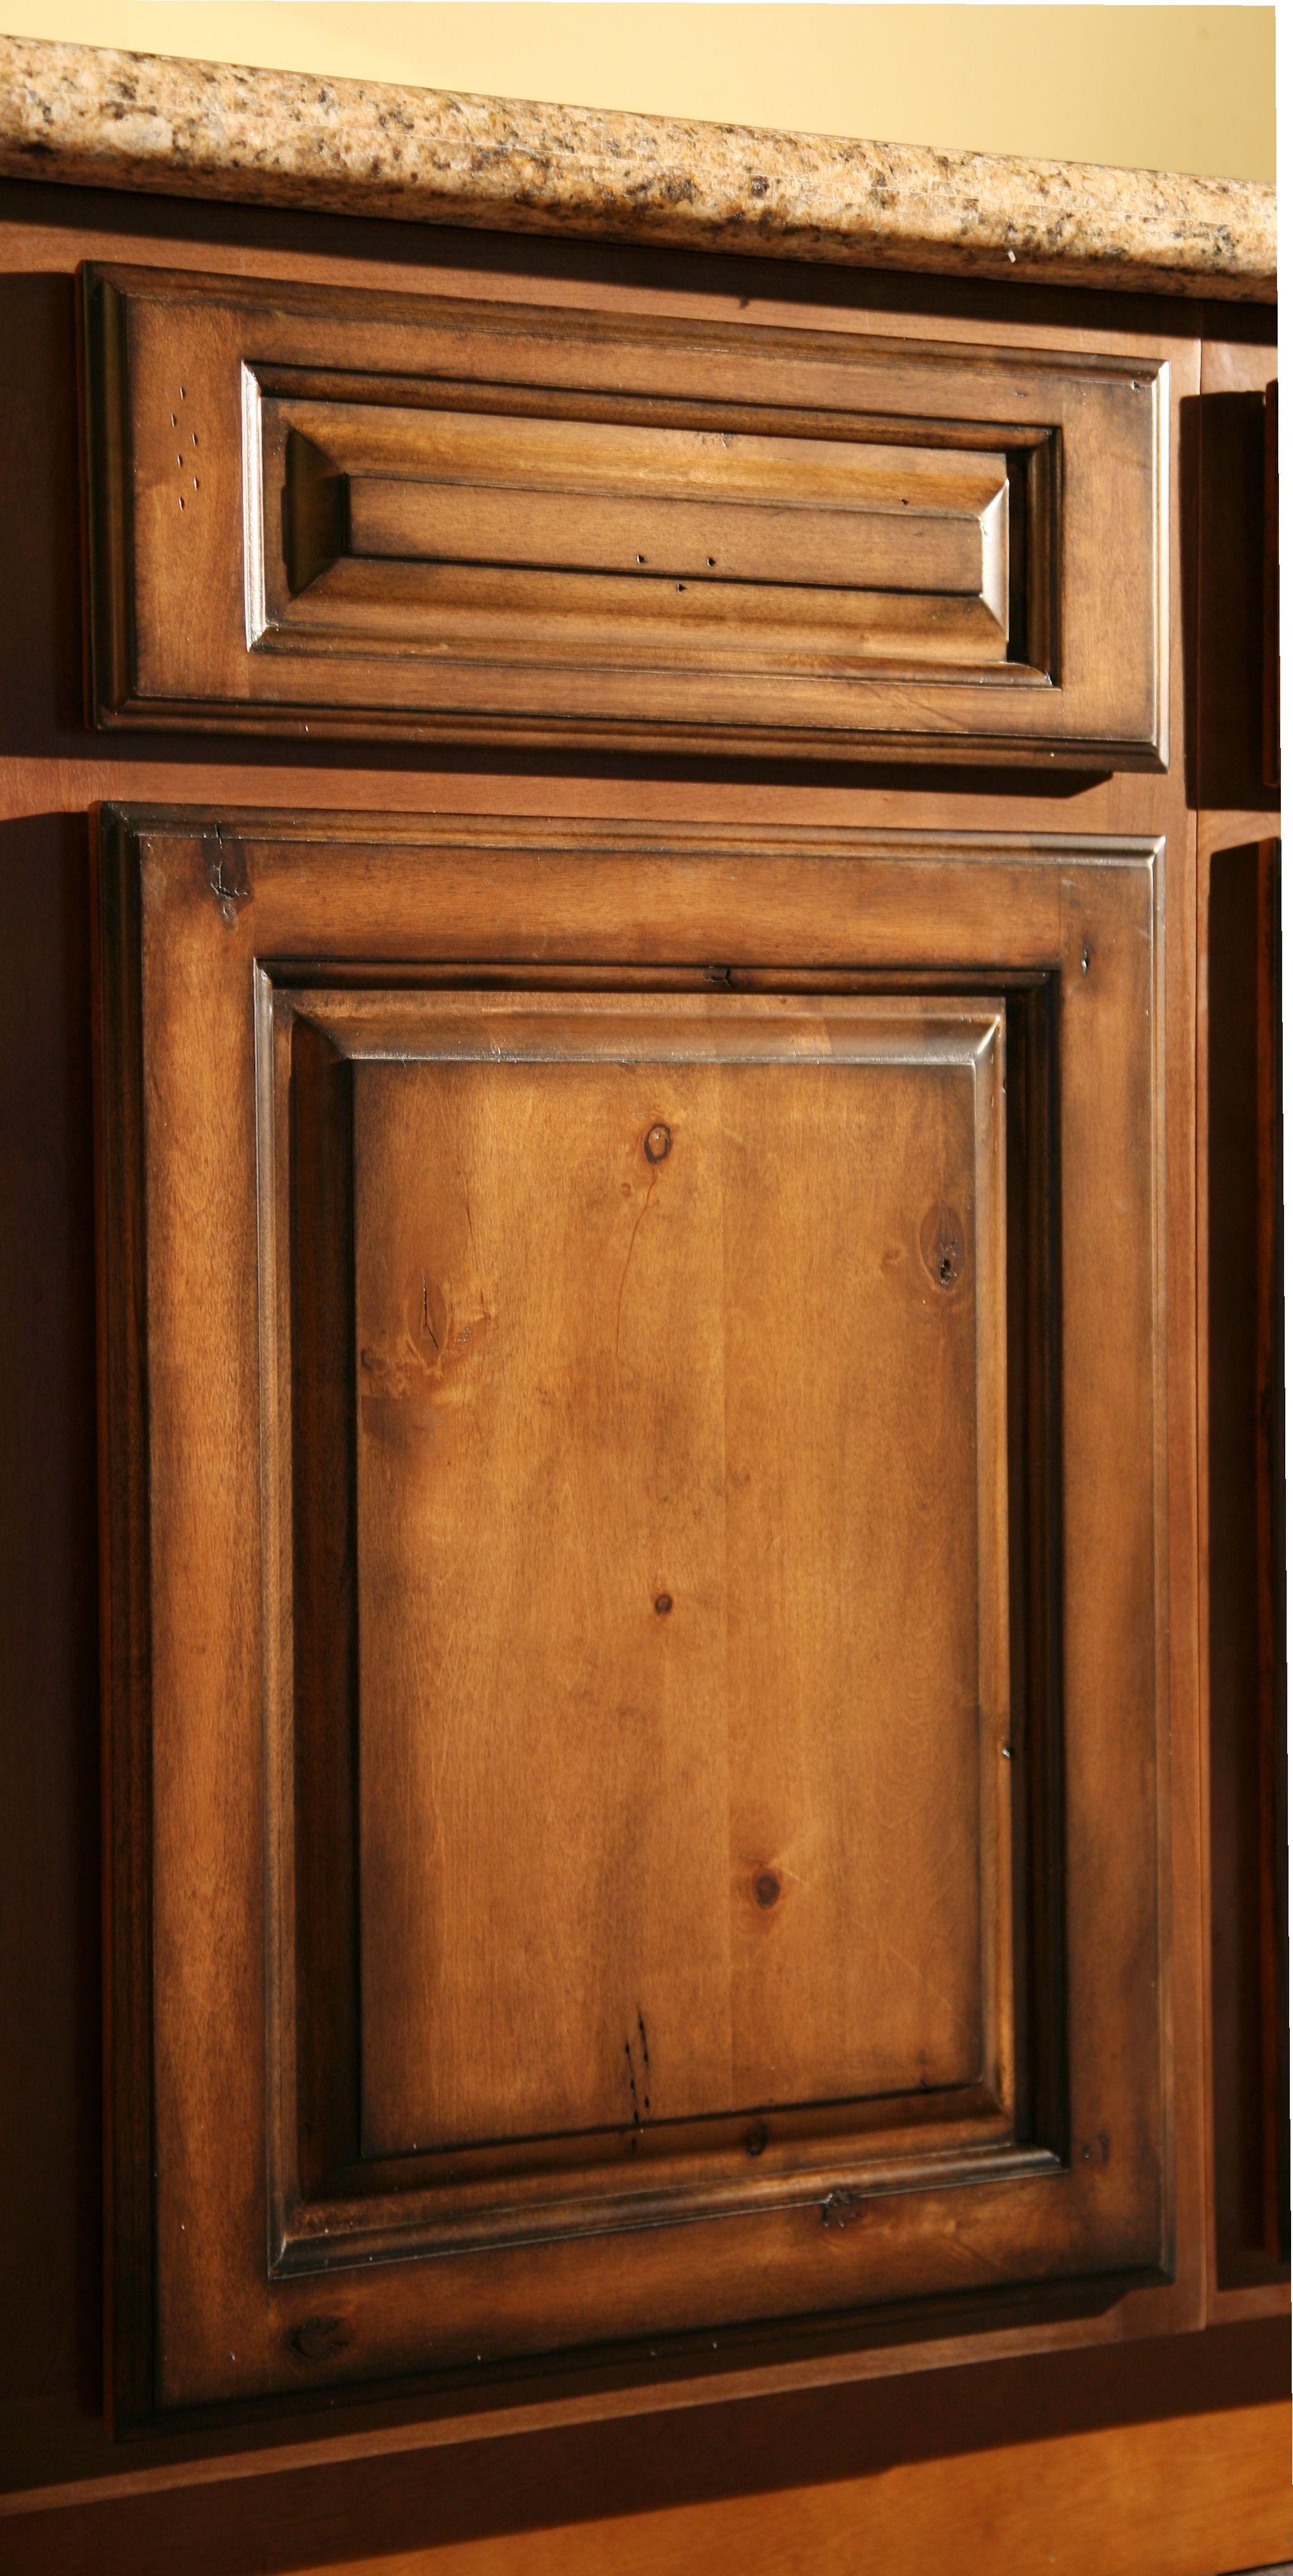 Pecan maple glaze kitchen cabinets rustic finish sample doorrta